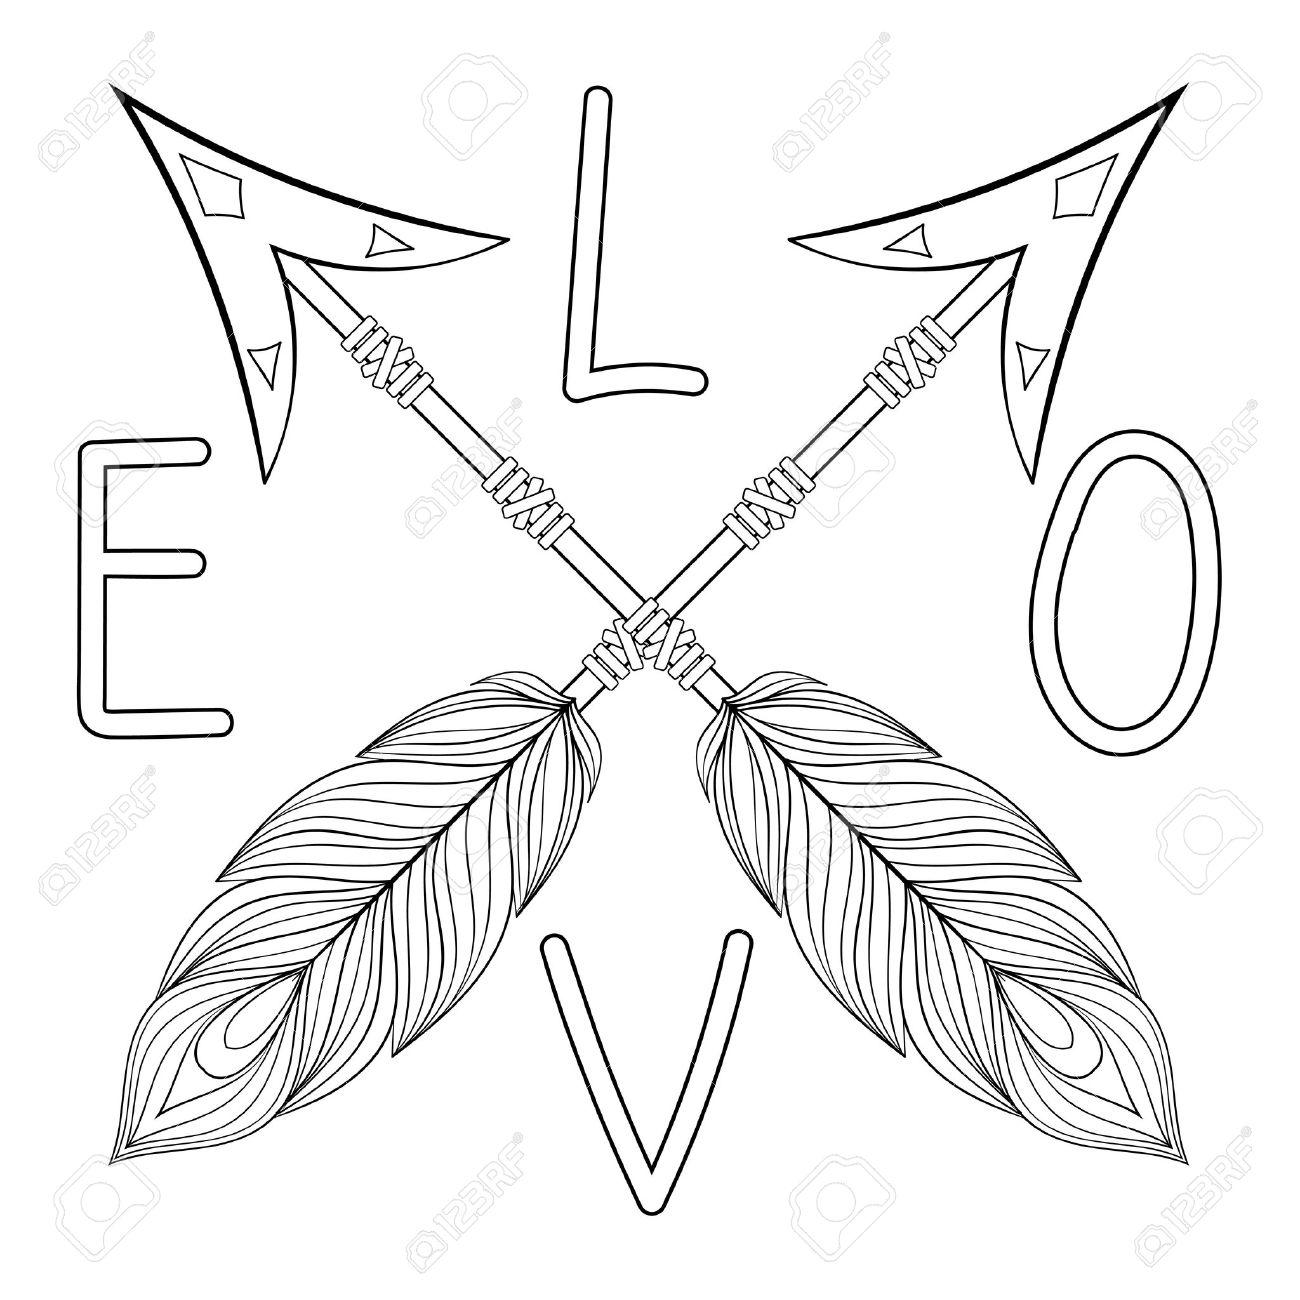 Indian Arrow Drawing At Getdrawings